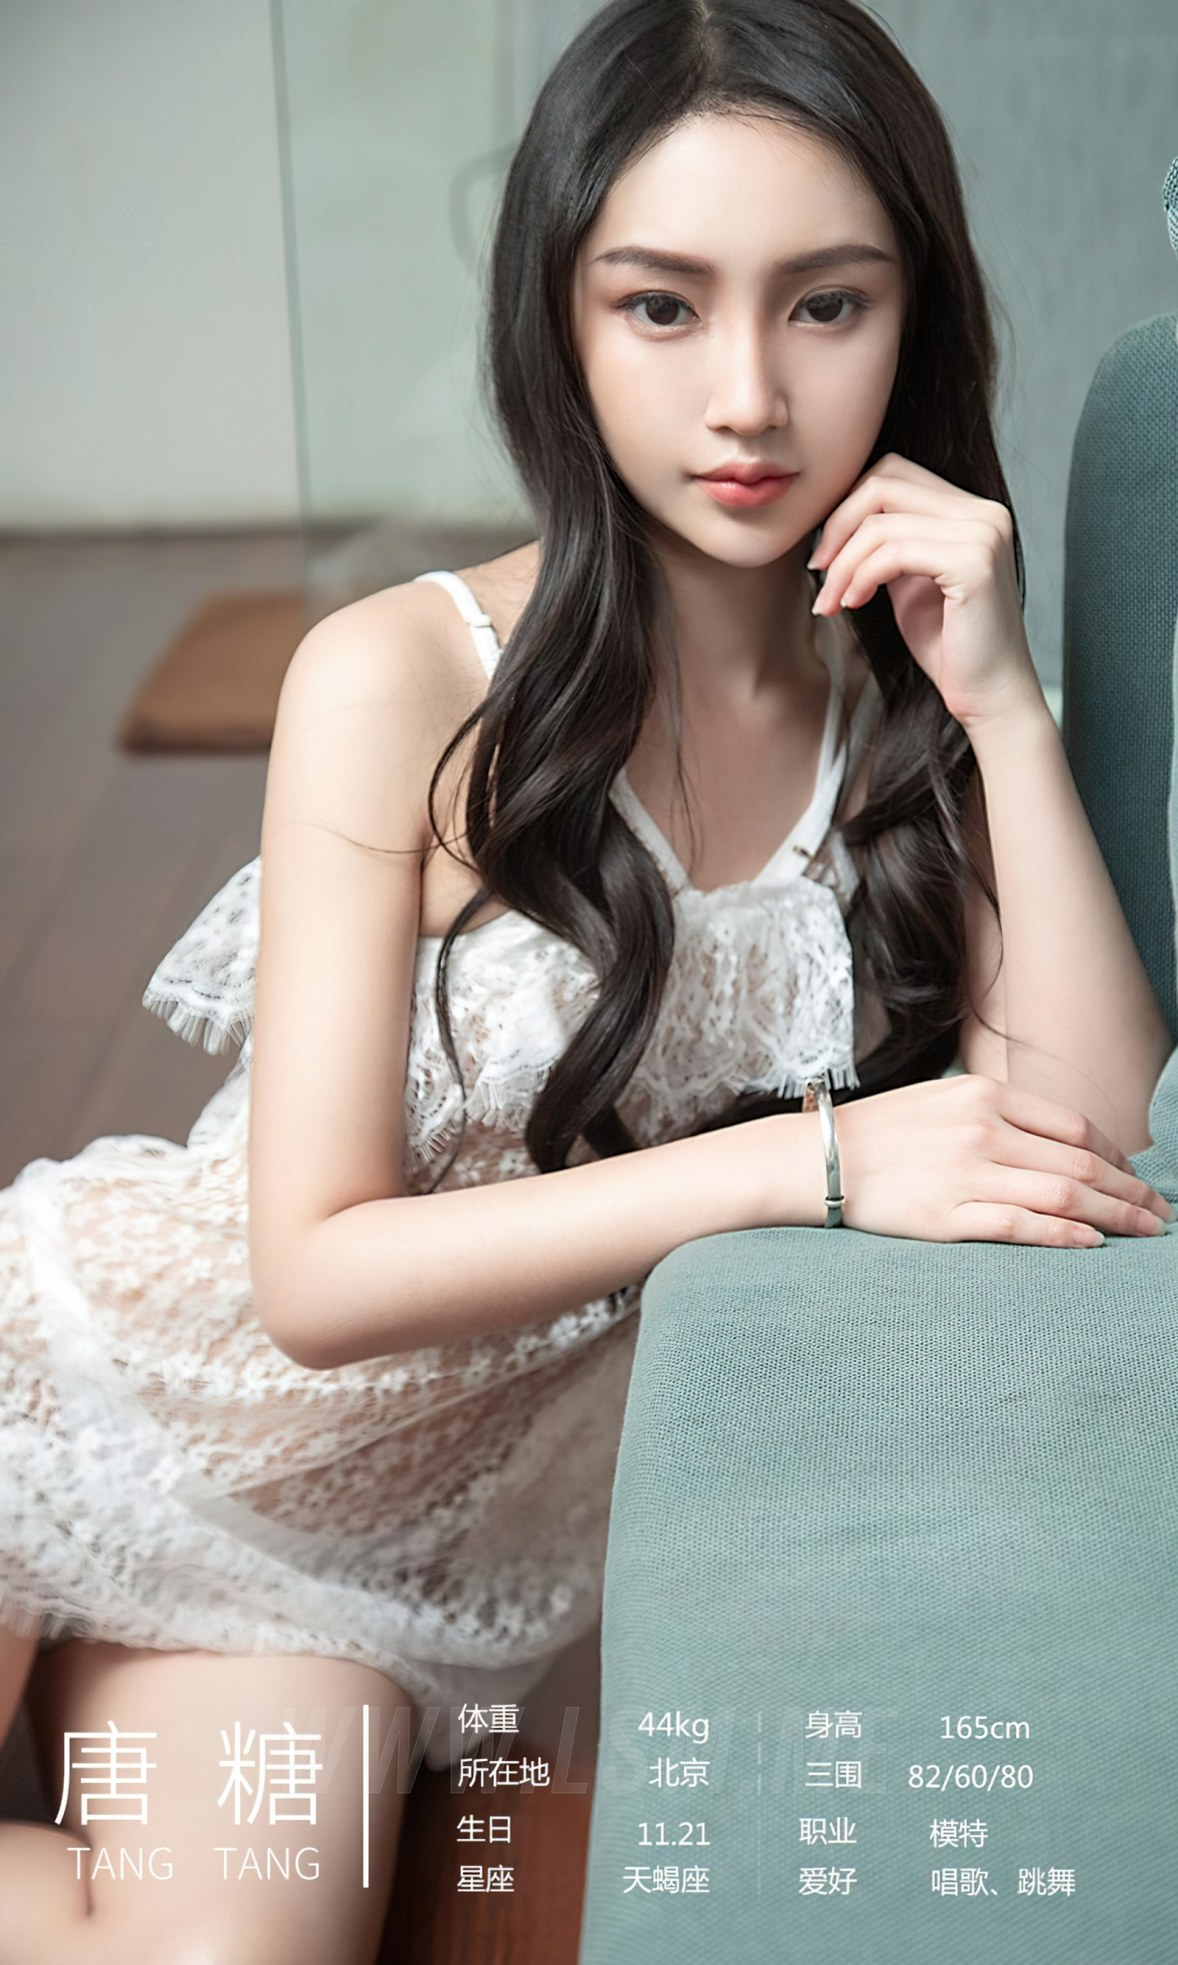 UGirls 爱尤物 No.2167  美人书 模特合辑唐糖和梦晗 - 3